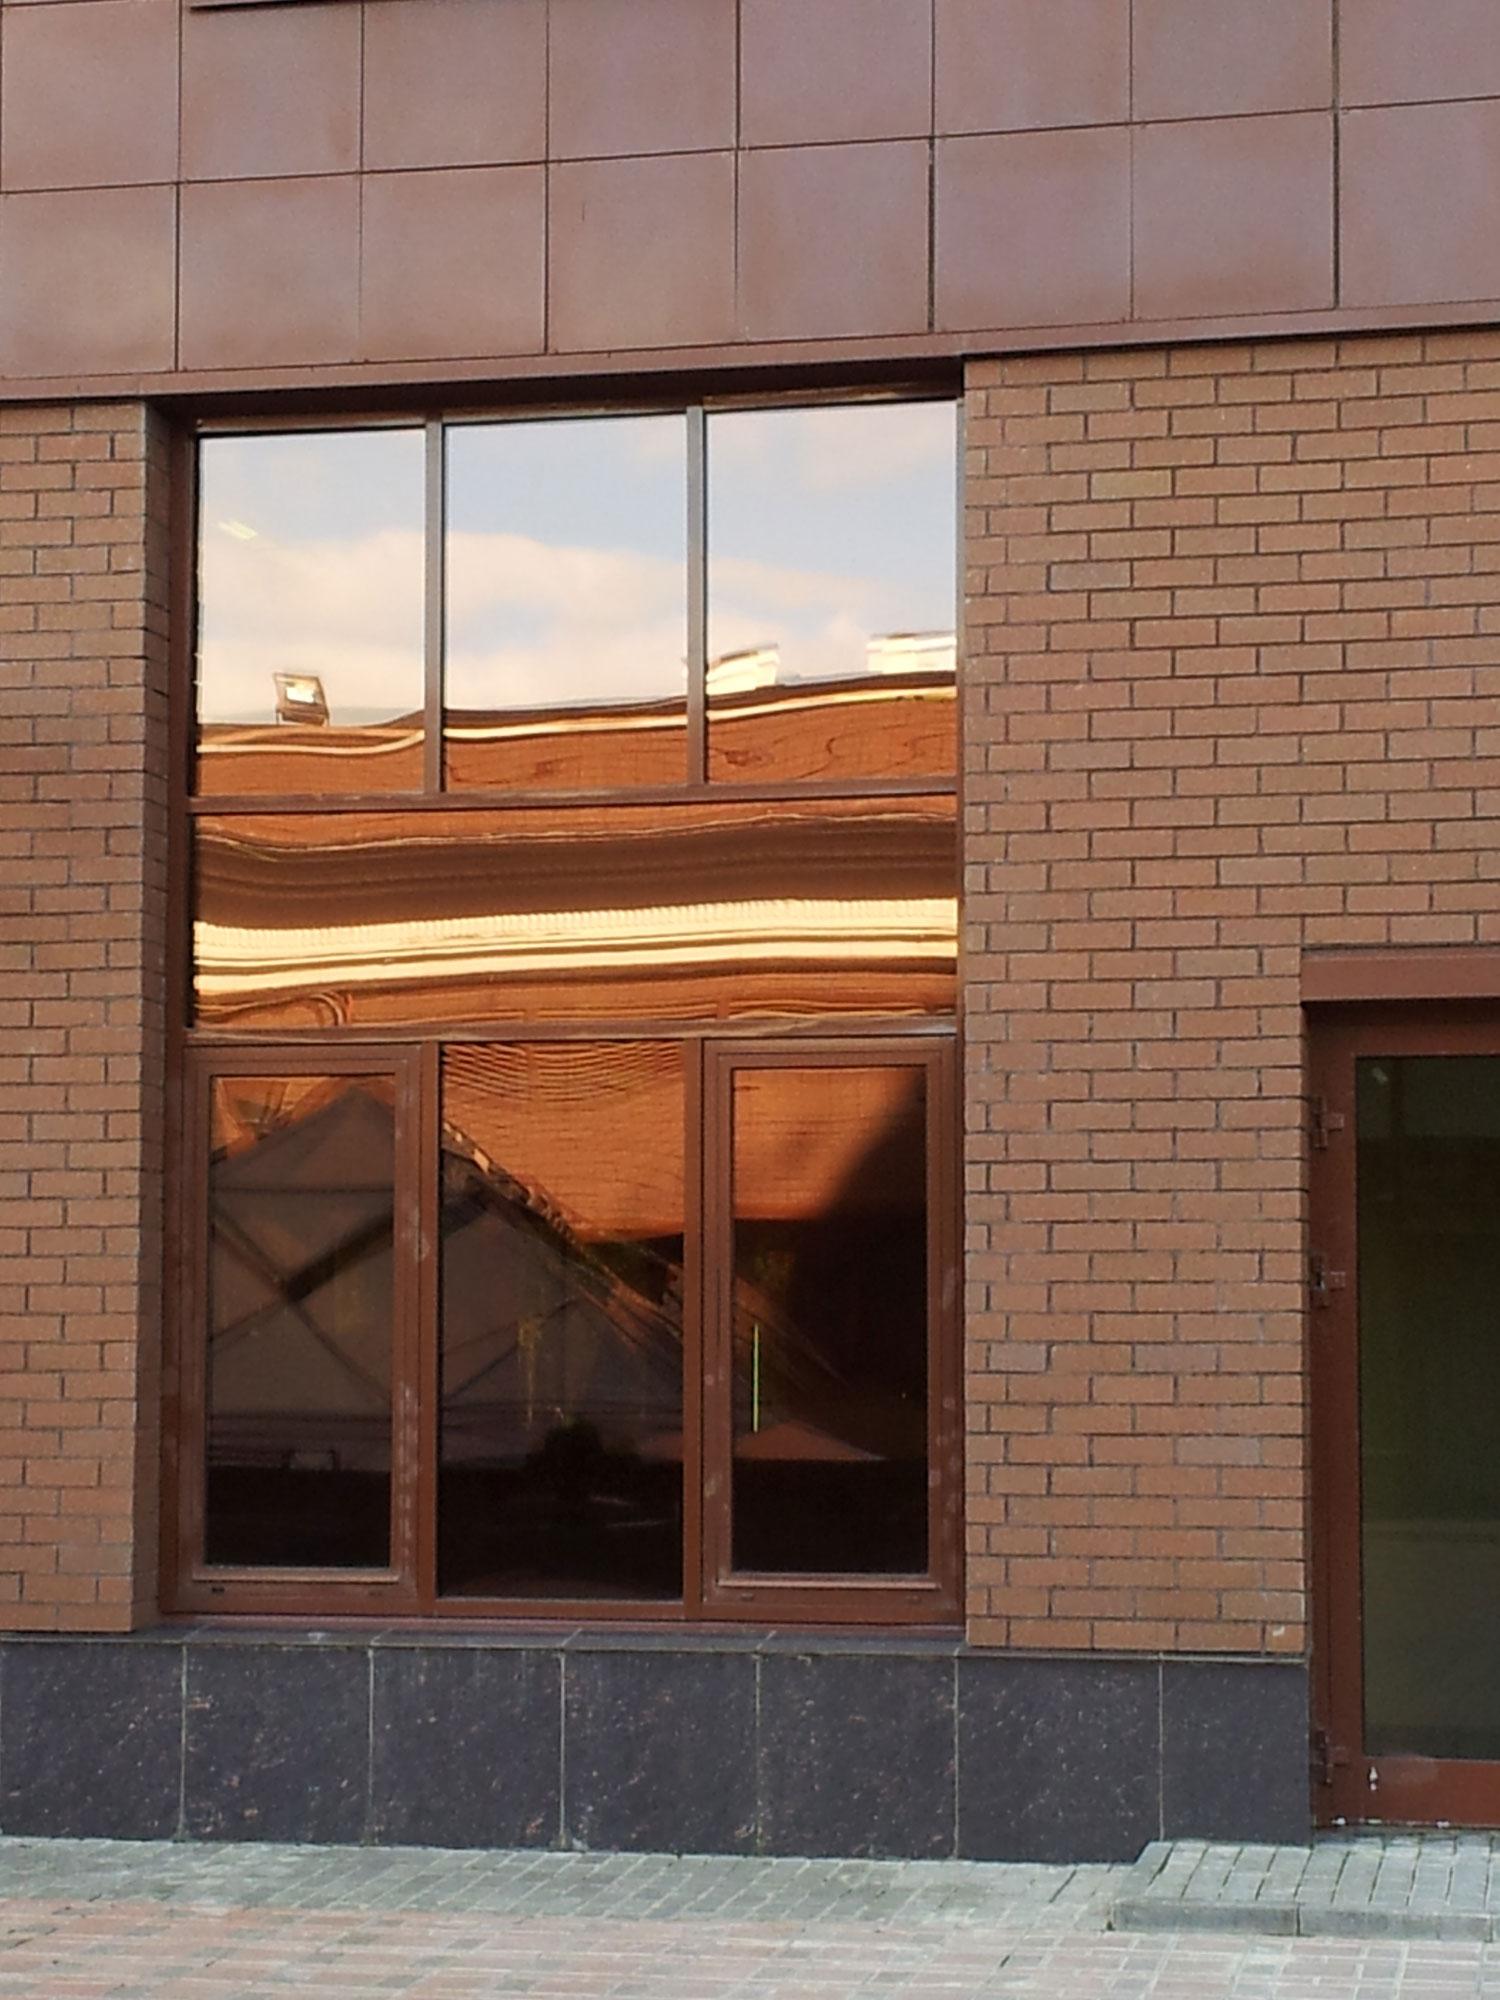 Пленка на окнах